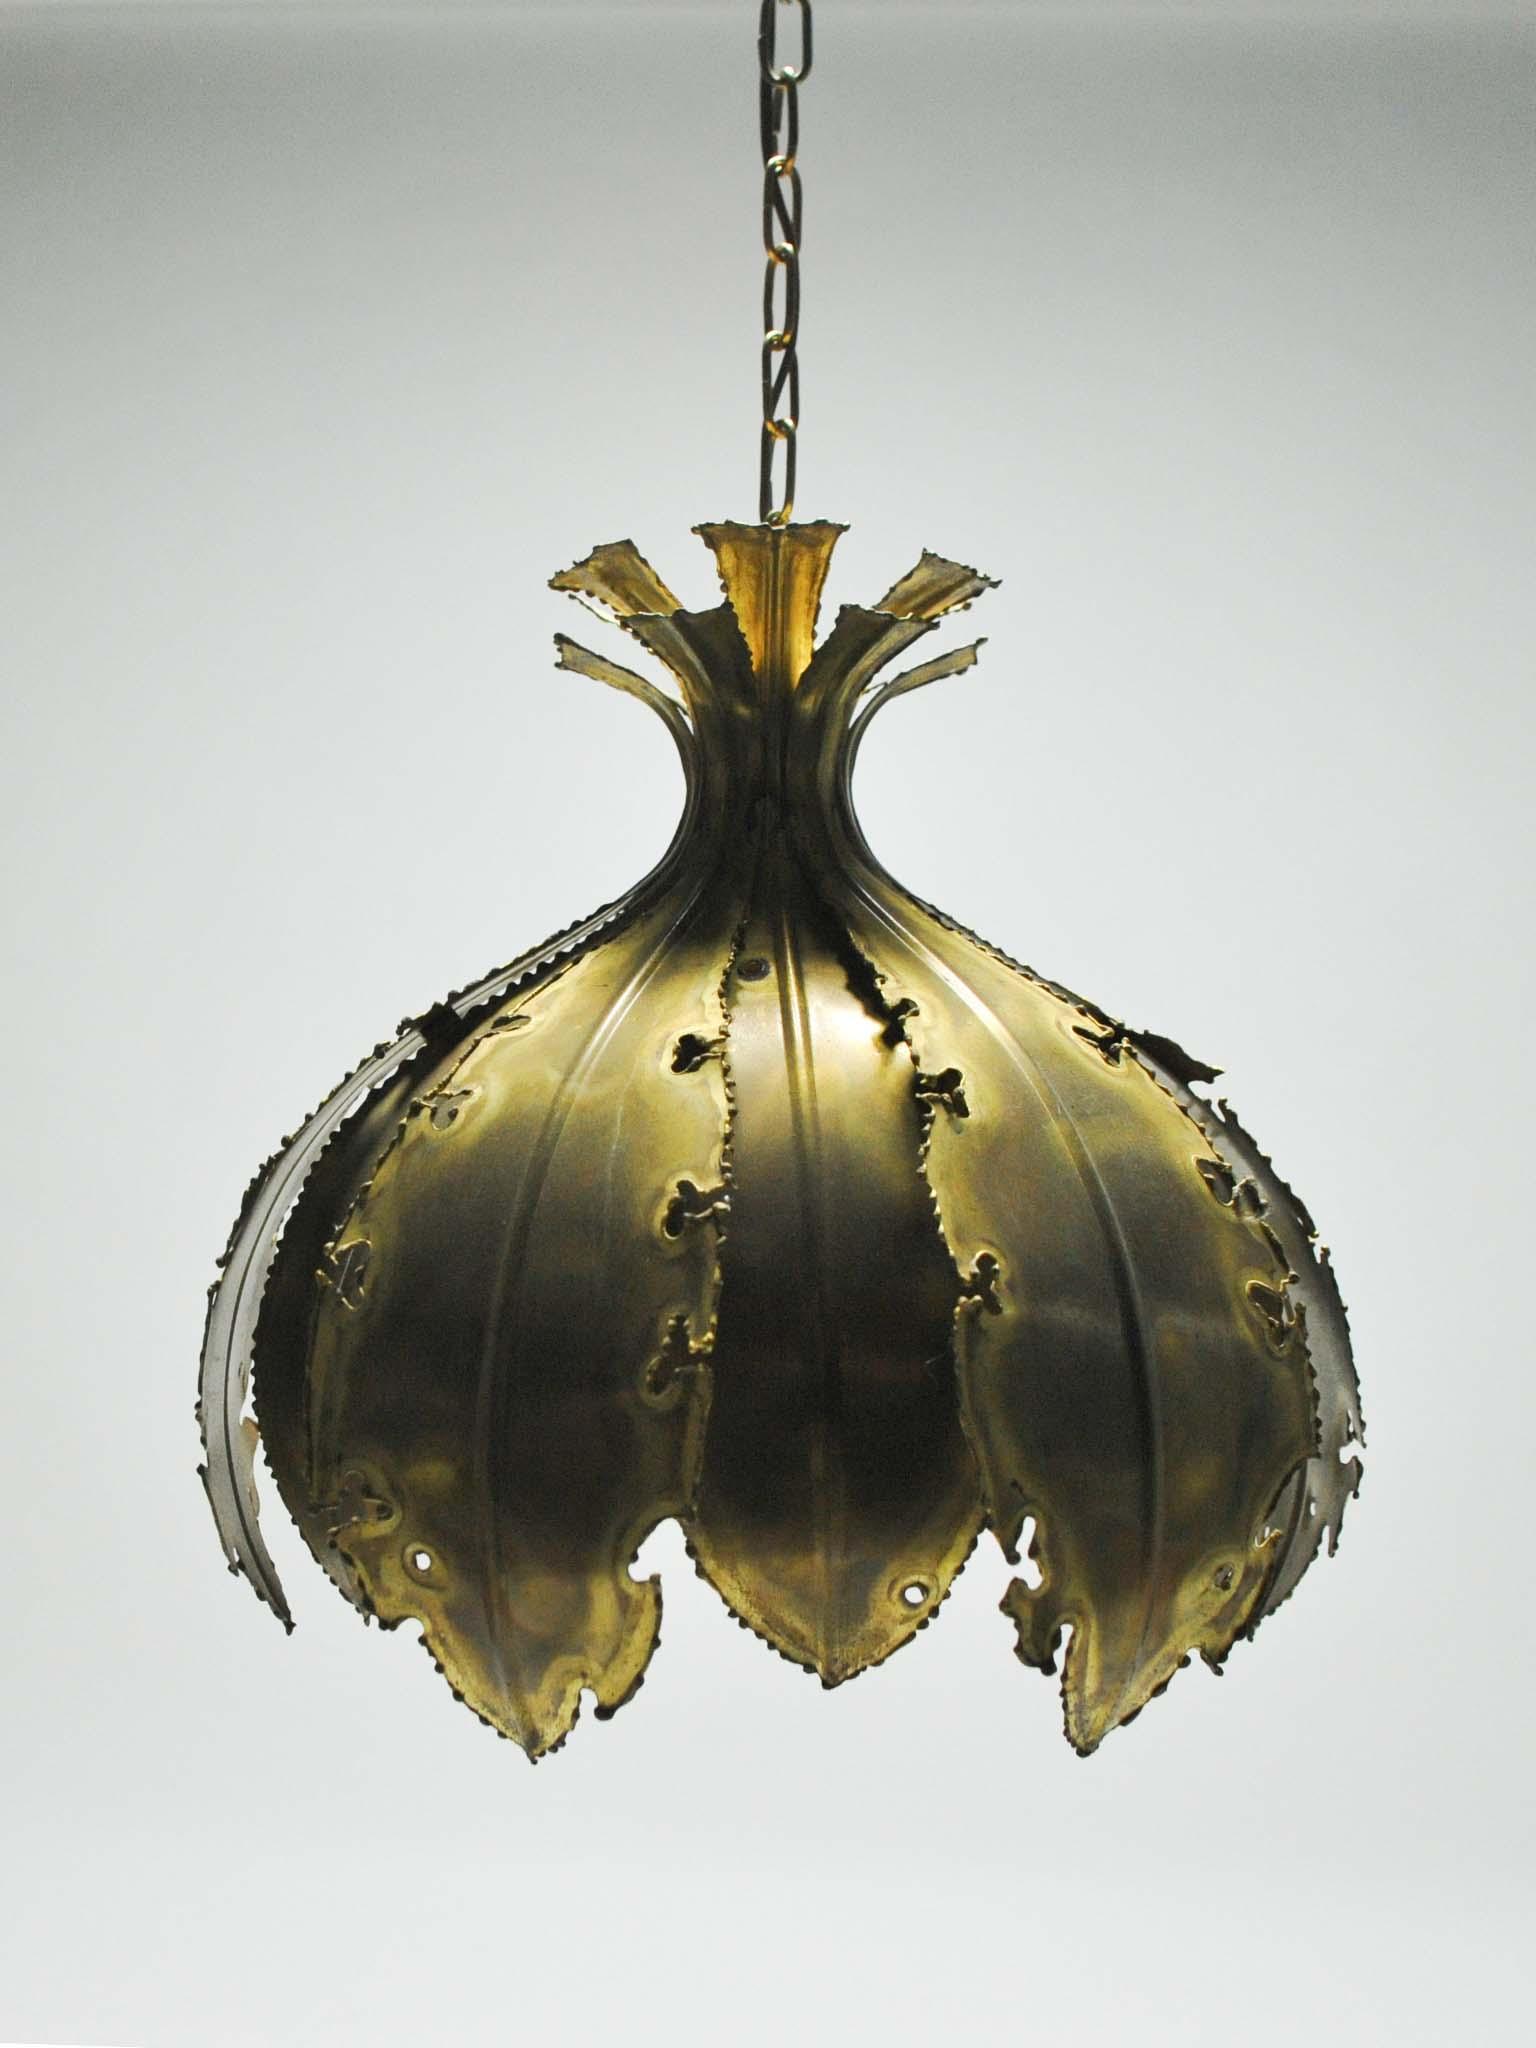 BRUTALIST CEILING LAMP BY SVEN AAGE HOLM-SORENSEN